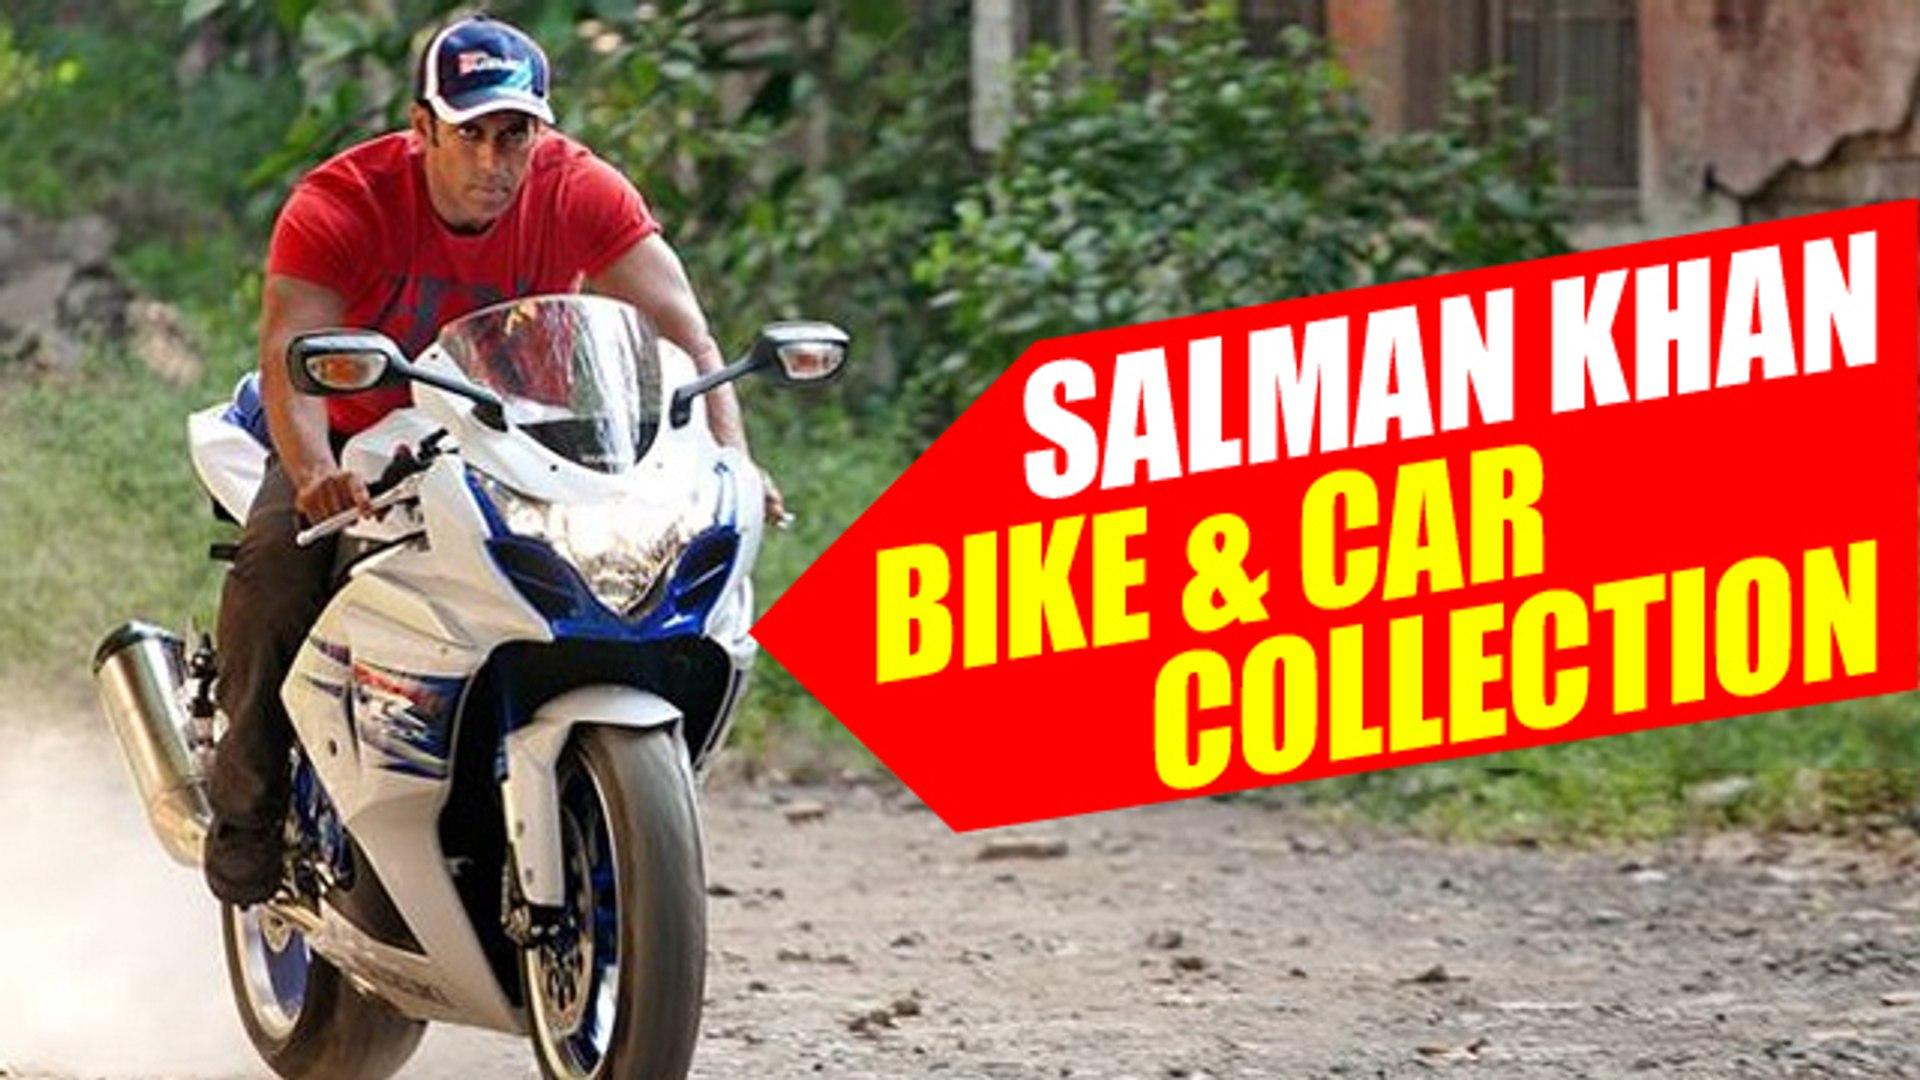 Salman Khan S Luxurious Car Bike Collection Video